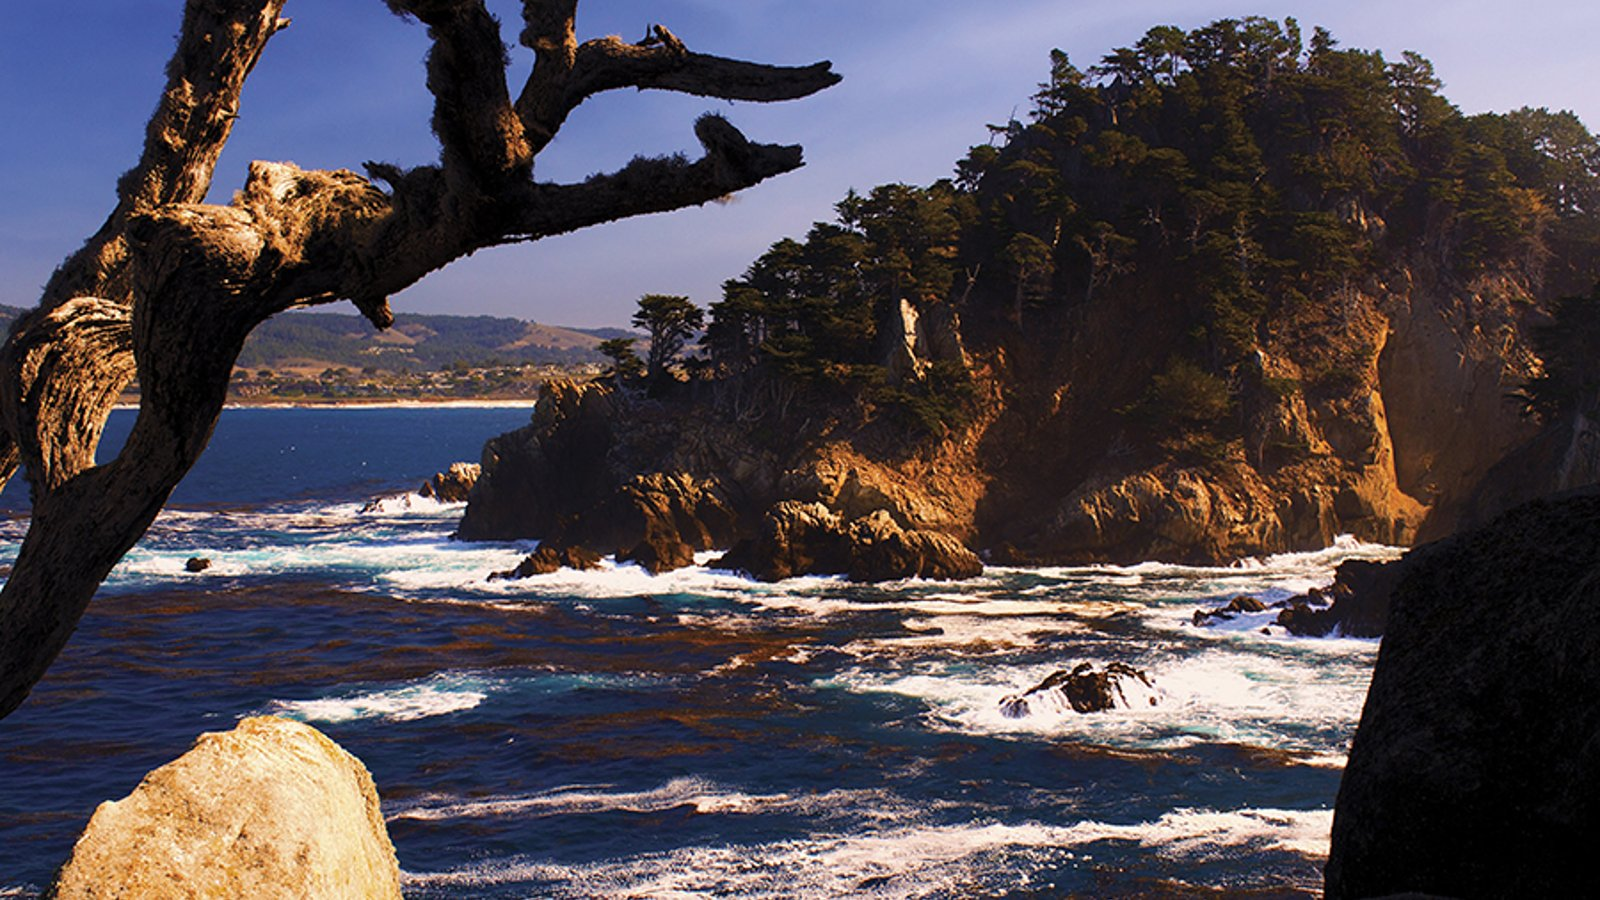 California Forever - Episode 2